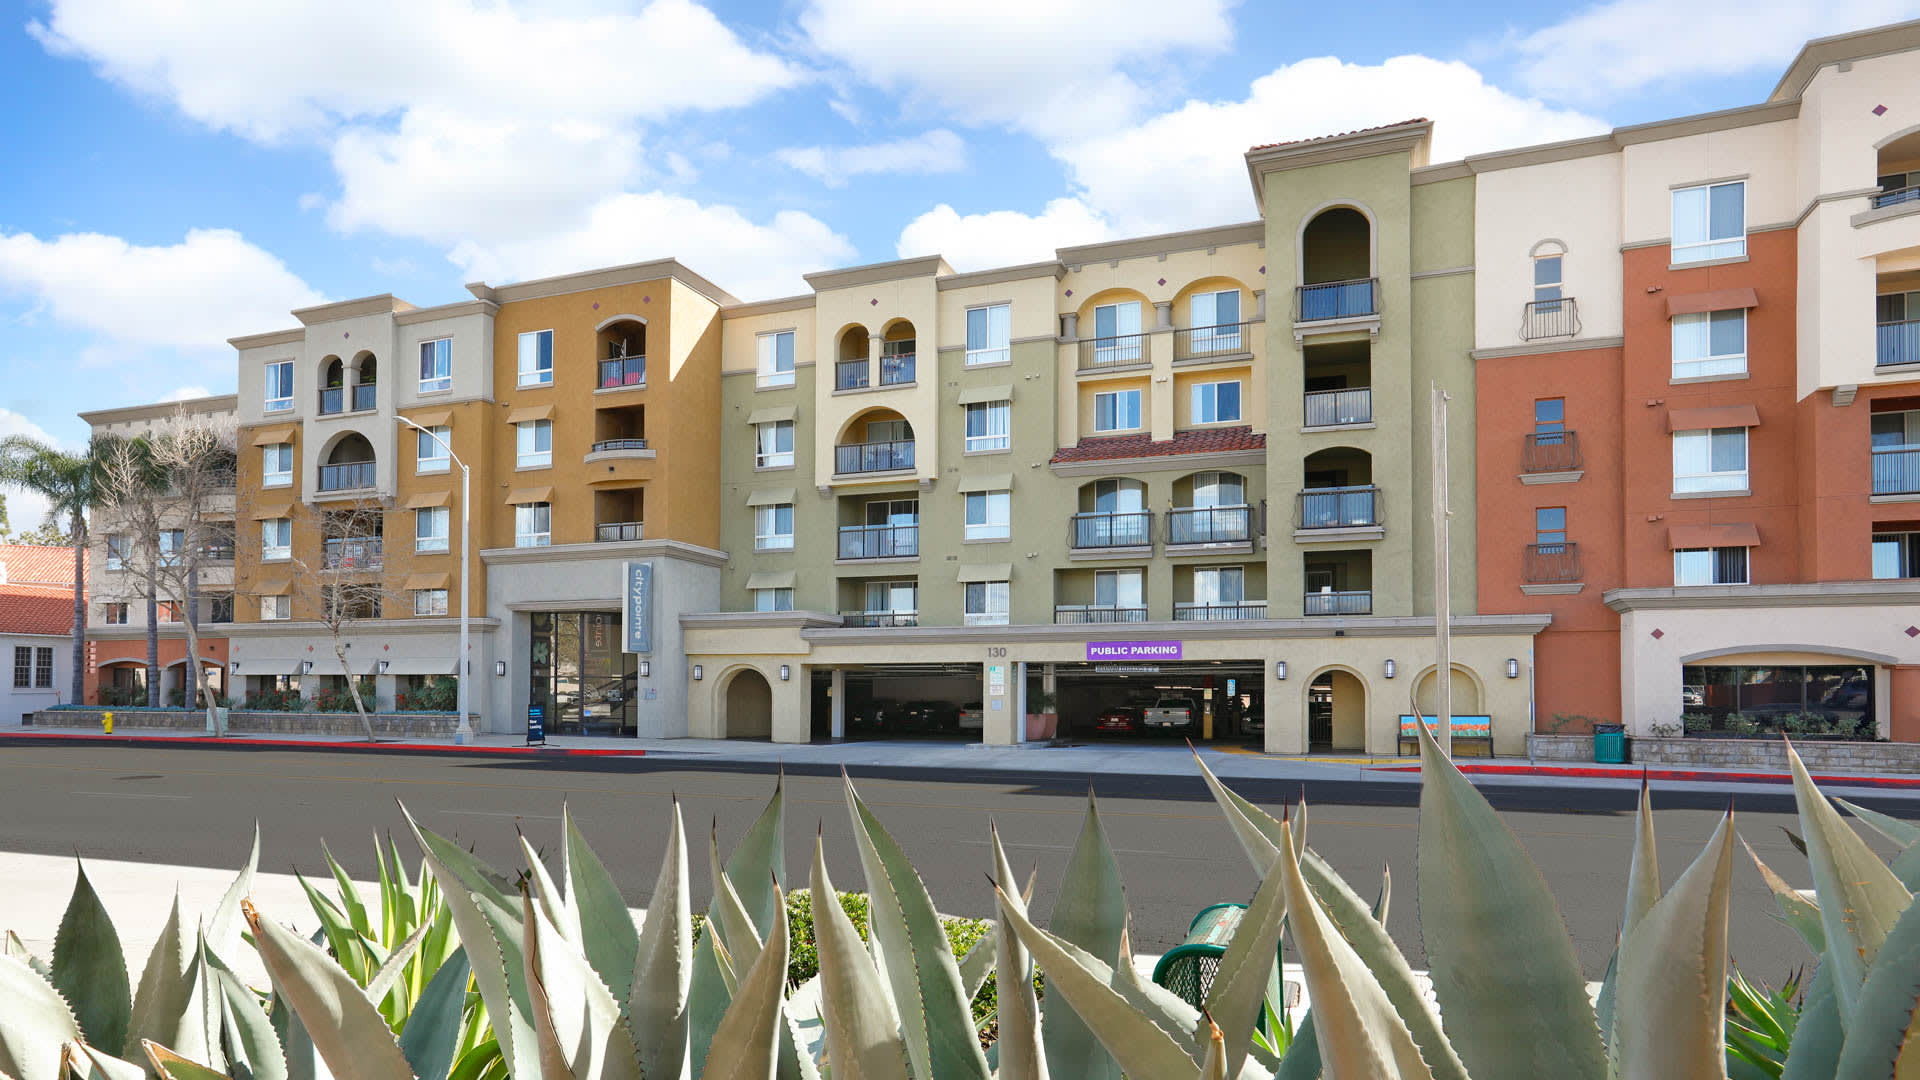 City Pointe Apartments - Exterior